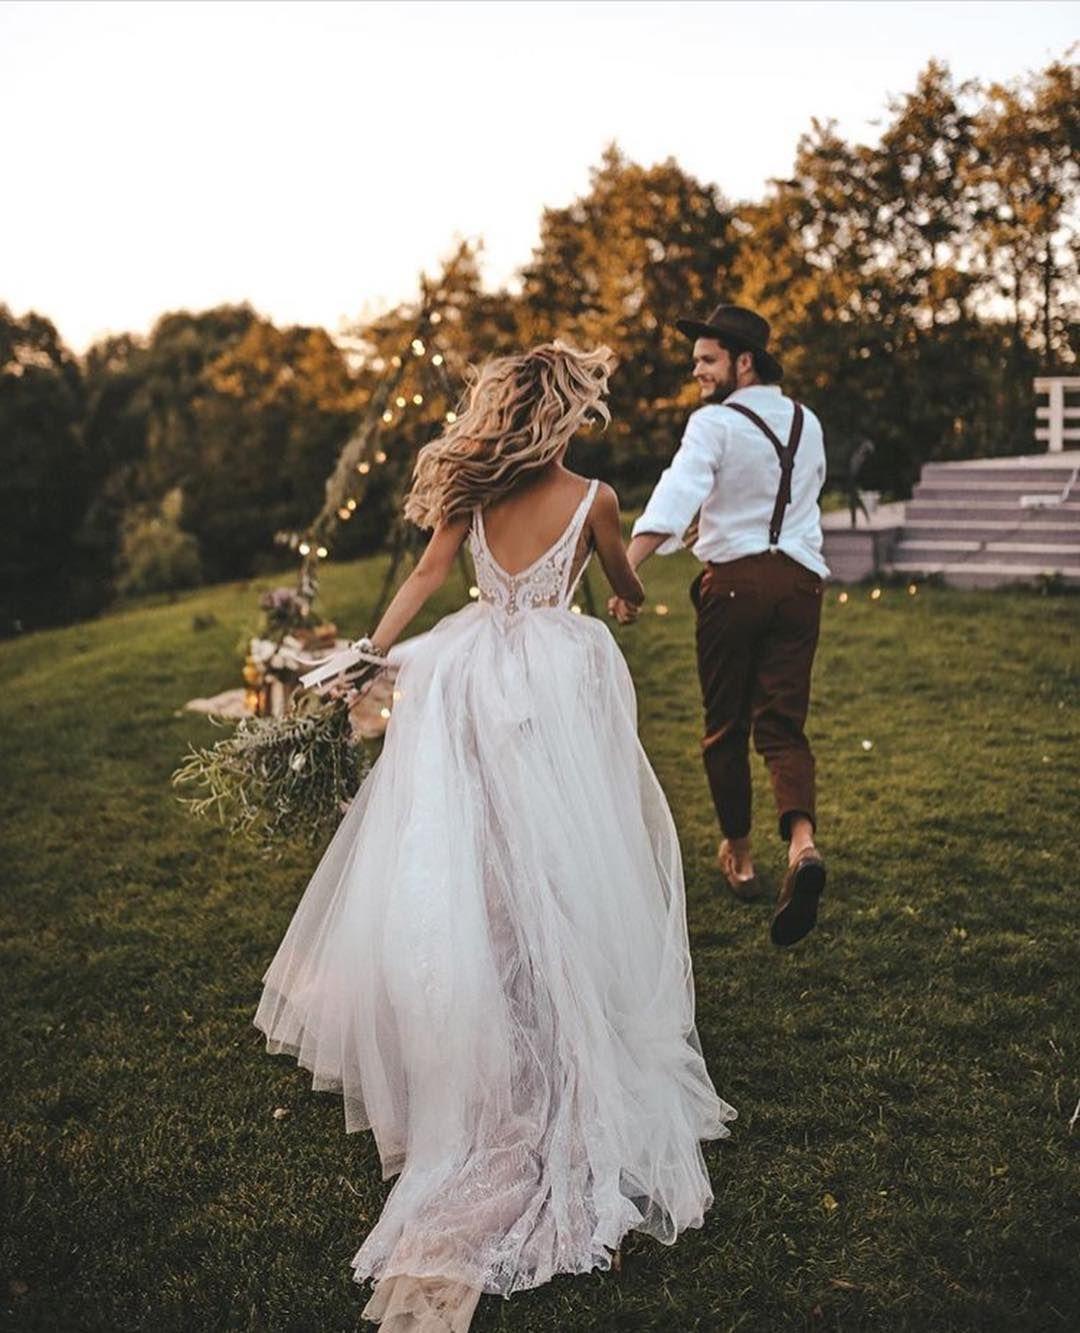 Romantic wedding dress idea - sweetheart neckline with floor-length veil {David ... 5